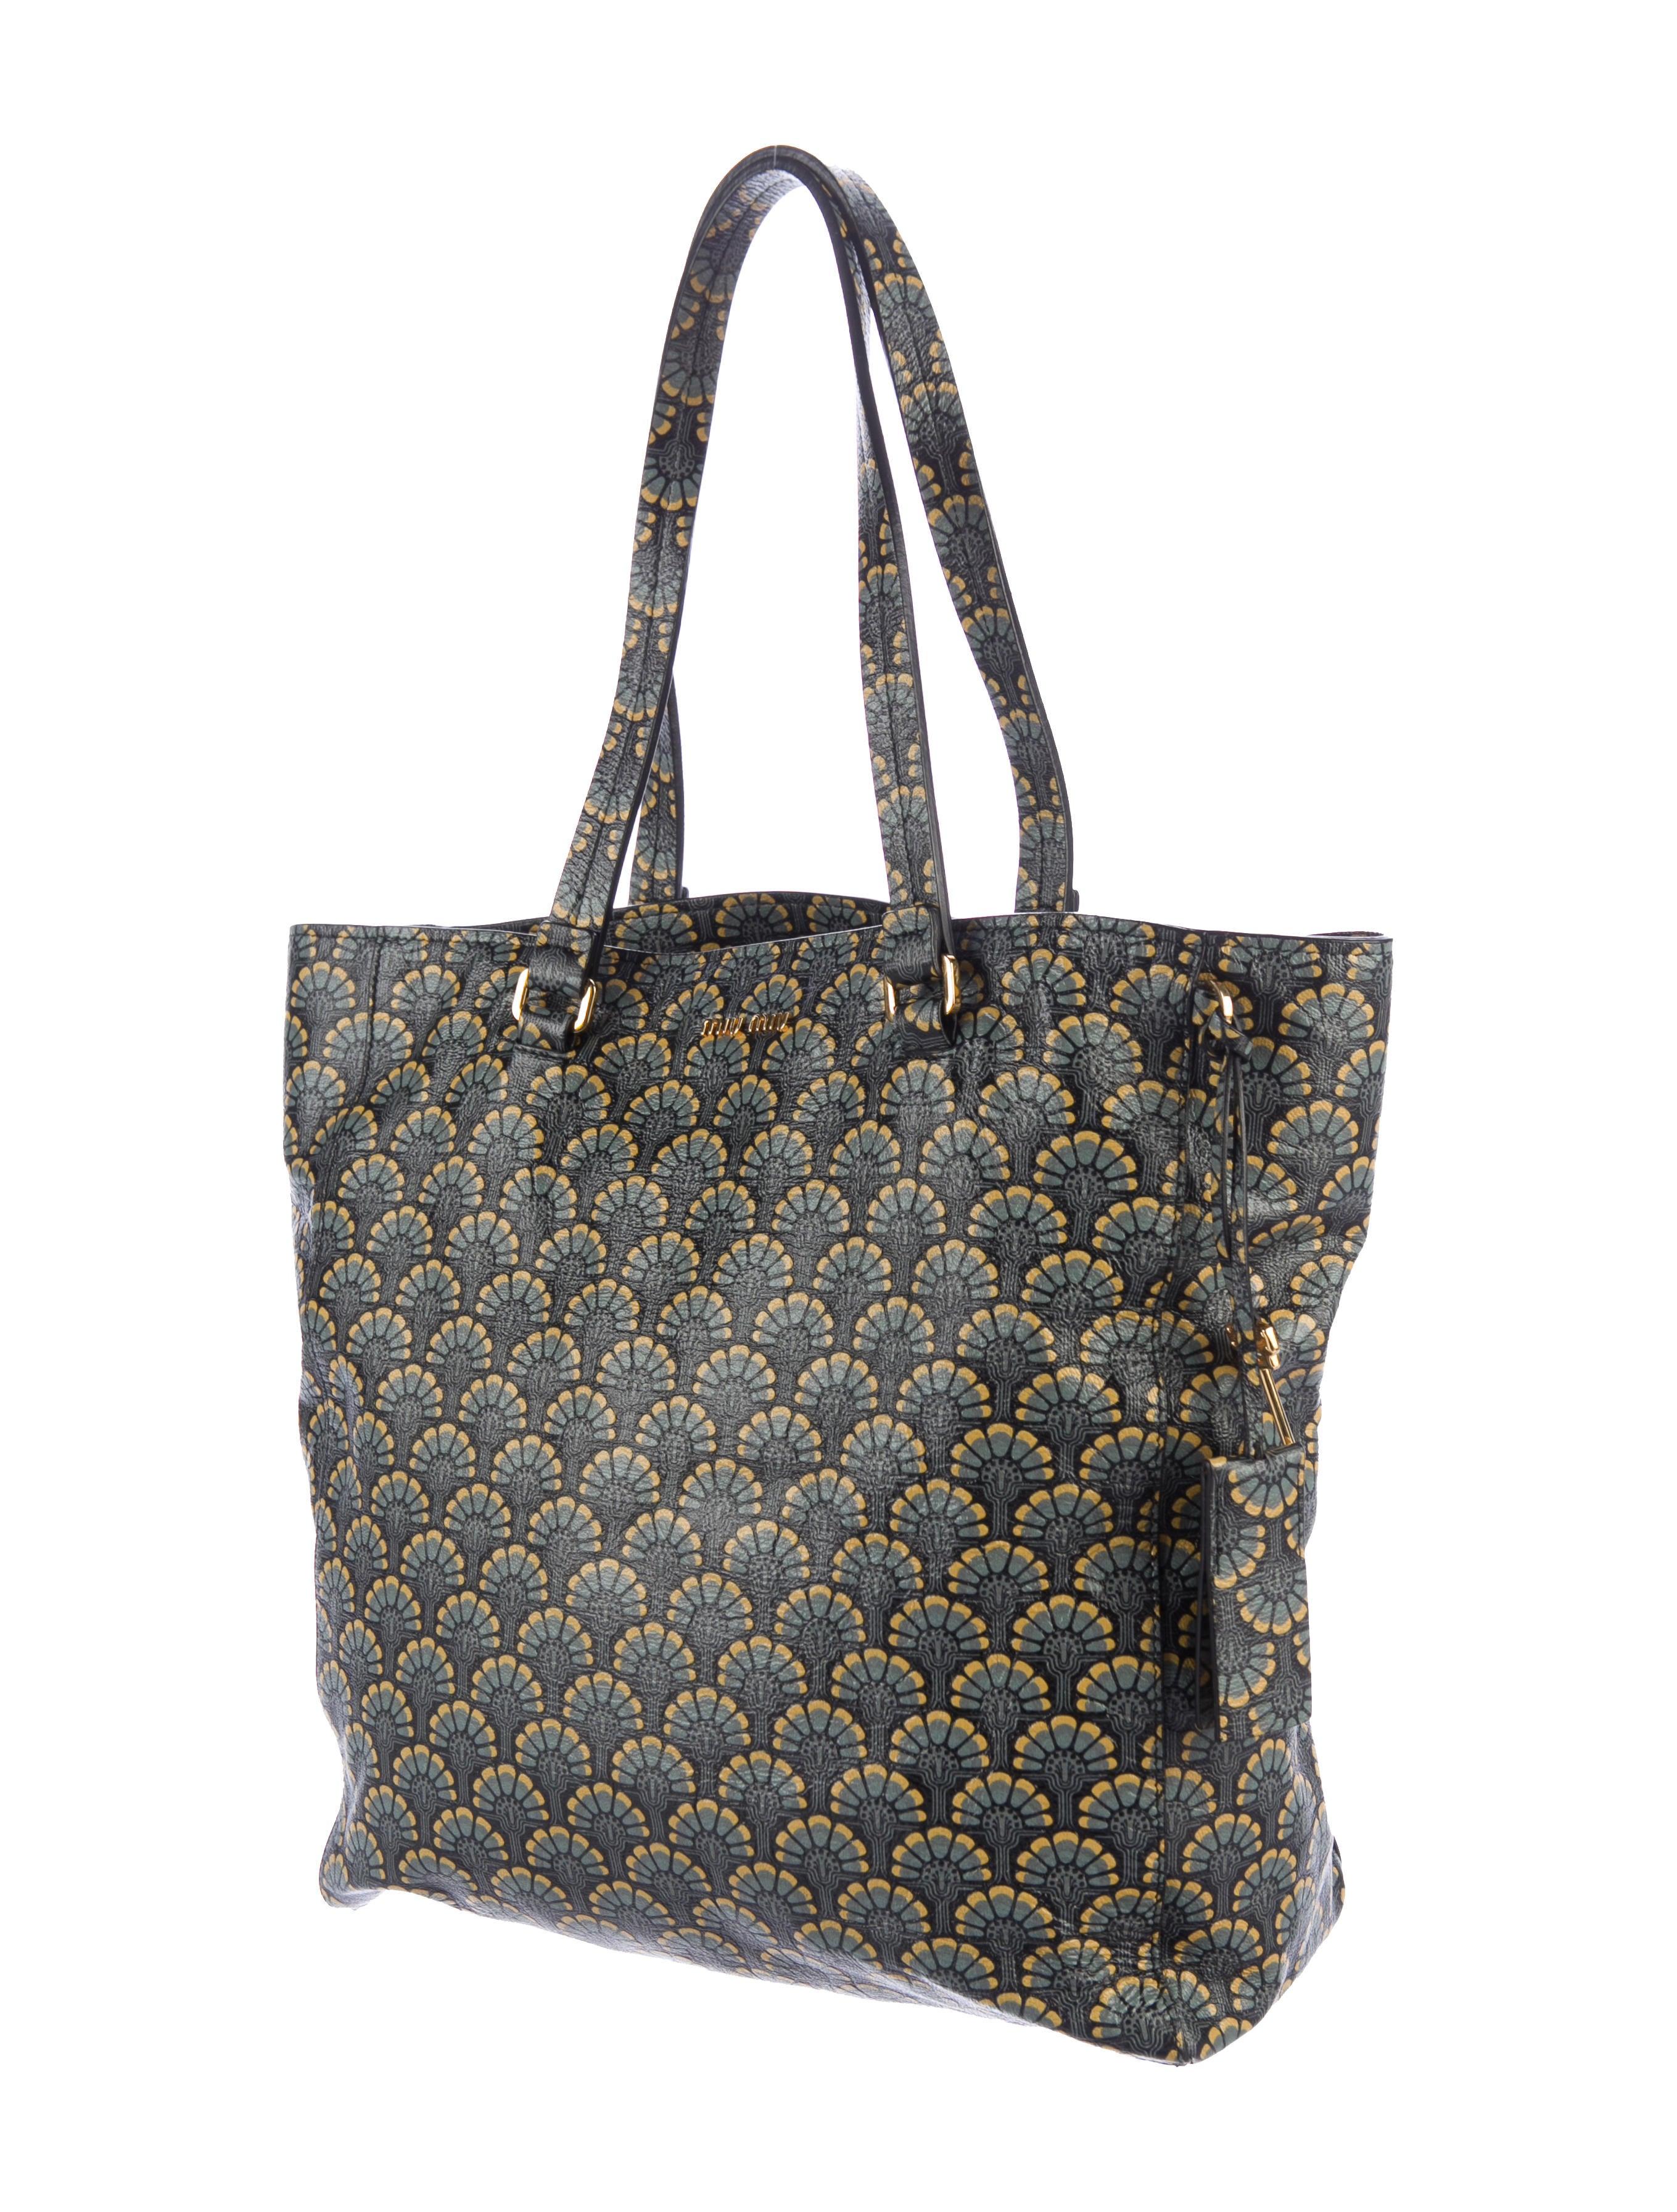 miu miu madras printed shopping tote handbags miu51742 the realreal. Black Bedroom Furniture Sets. Home Design Ideas